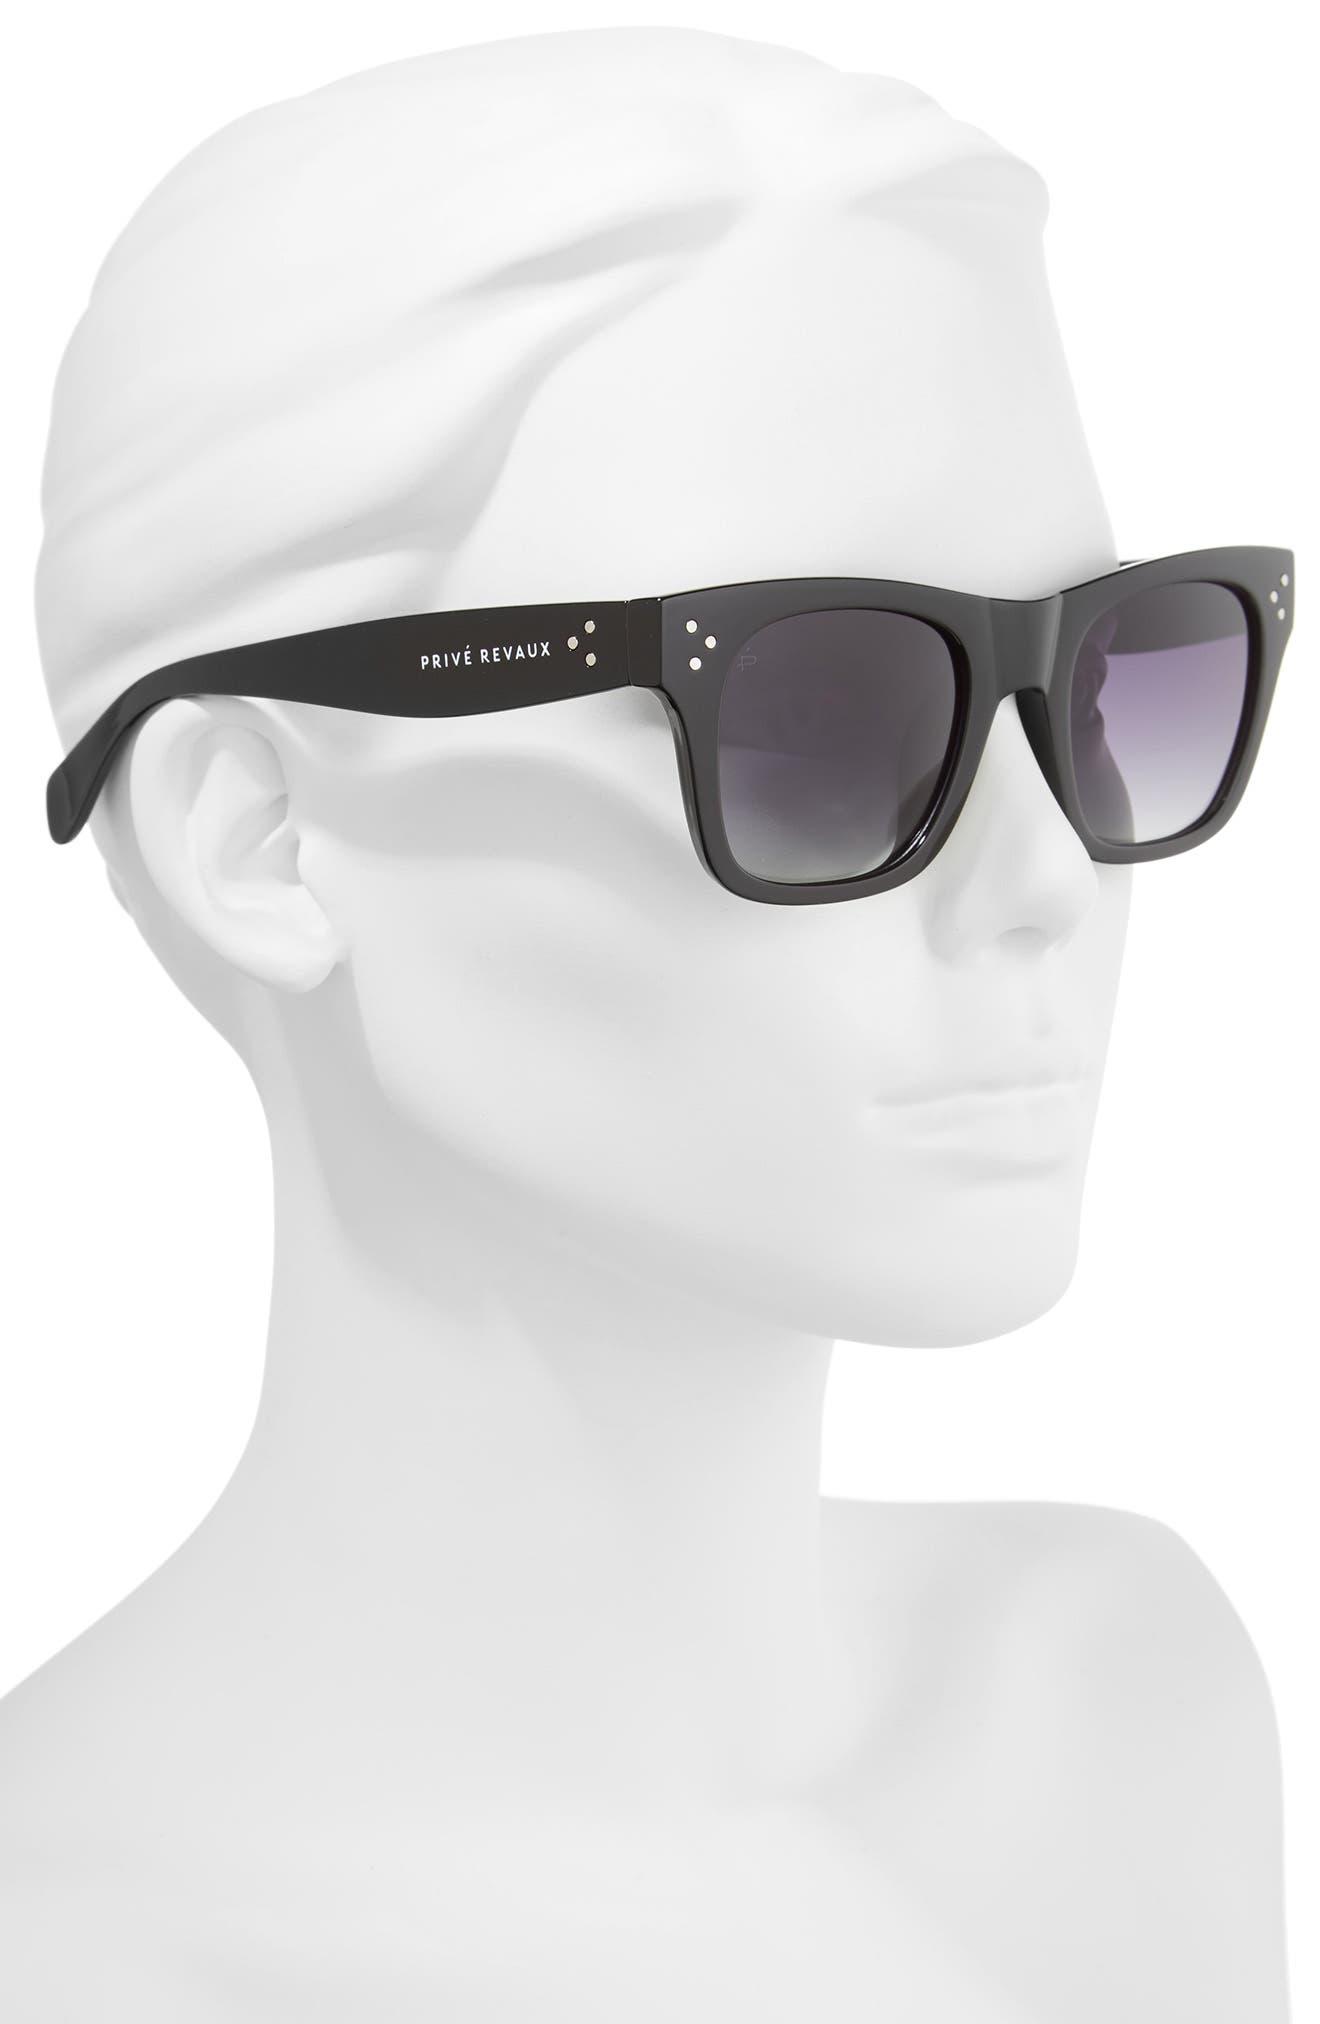 Privé Revaux The Classic 51mm Polarized Square Sunglasses,                             Alternate thumbnail 4, color,                             Black